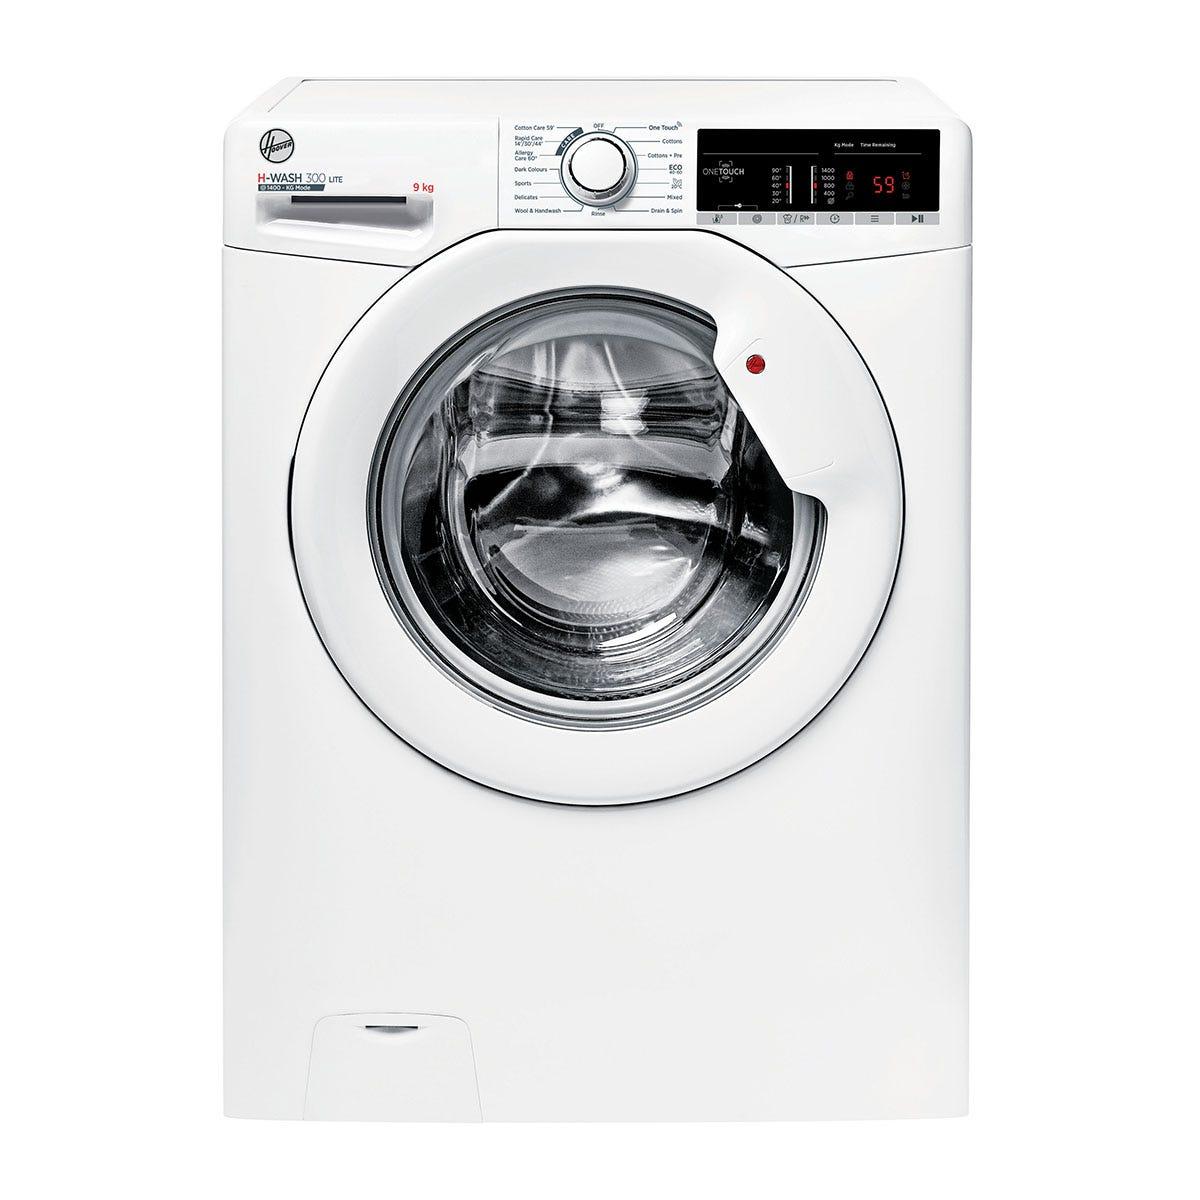 Hoover H3W49TE H-Wash 300 9kg 1400rpm Digital NFC-Enabled Washing Machine - White